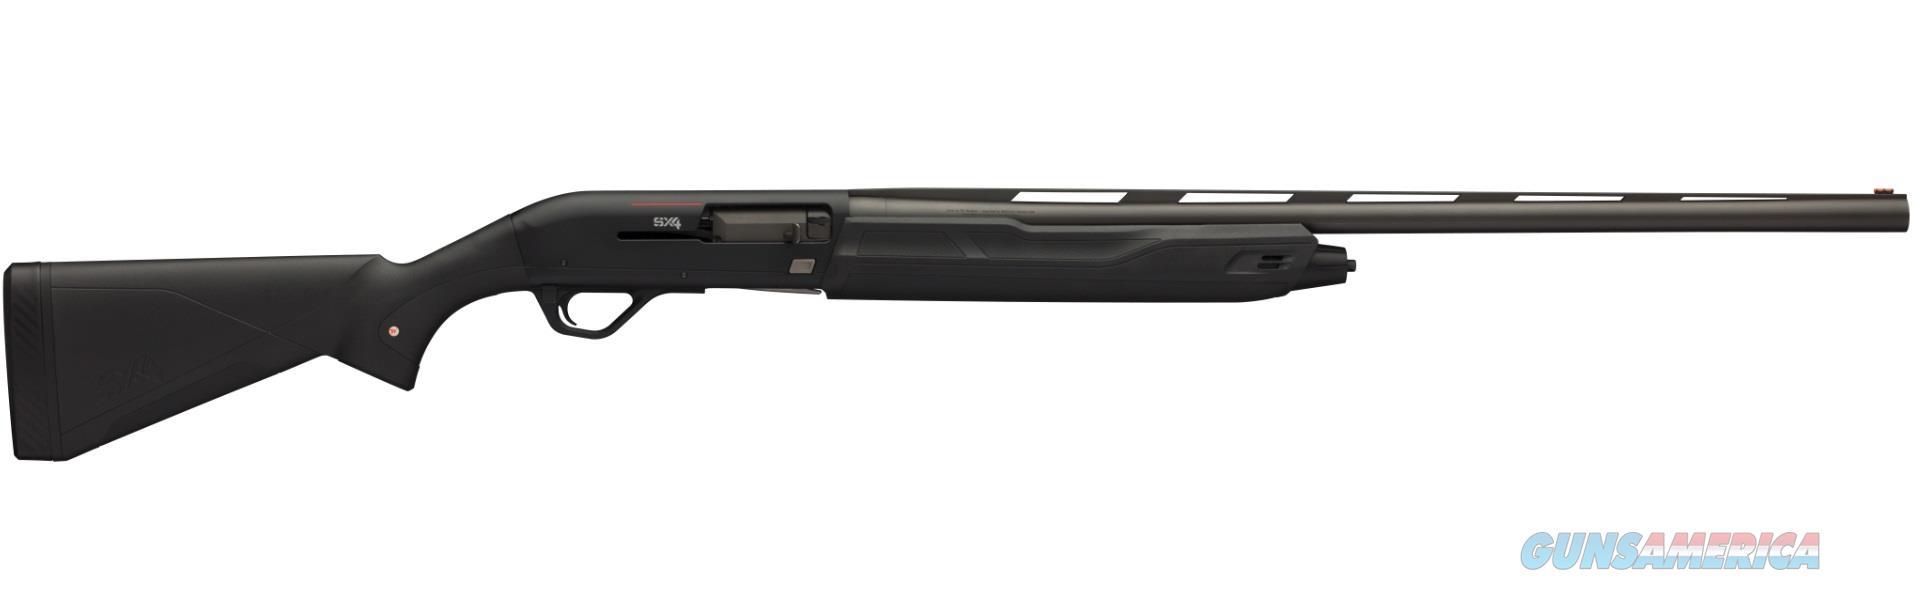 Winchester SX4 Black 20g 3in 28in  Guns > Shotguns > Winchester Shotguns - Modern > Autoloaders > Hunting